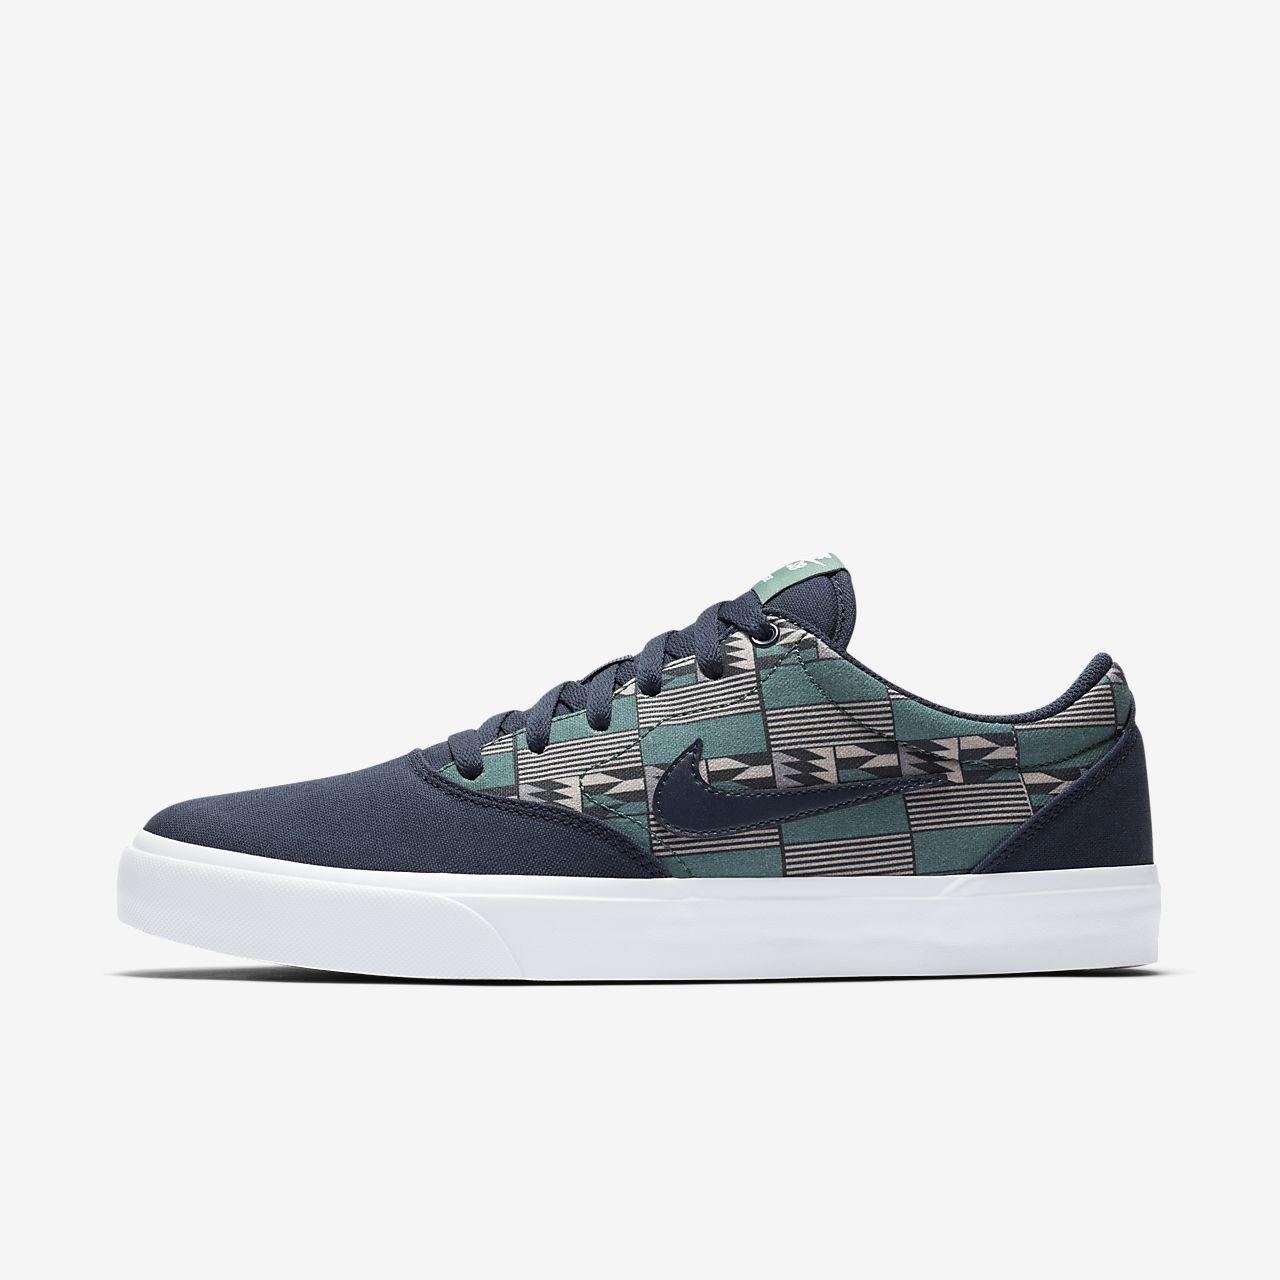 Nike SB Charge Premium Zapatillas de skateboard